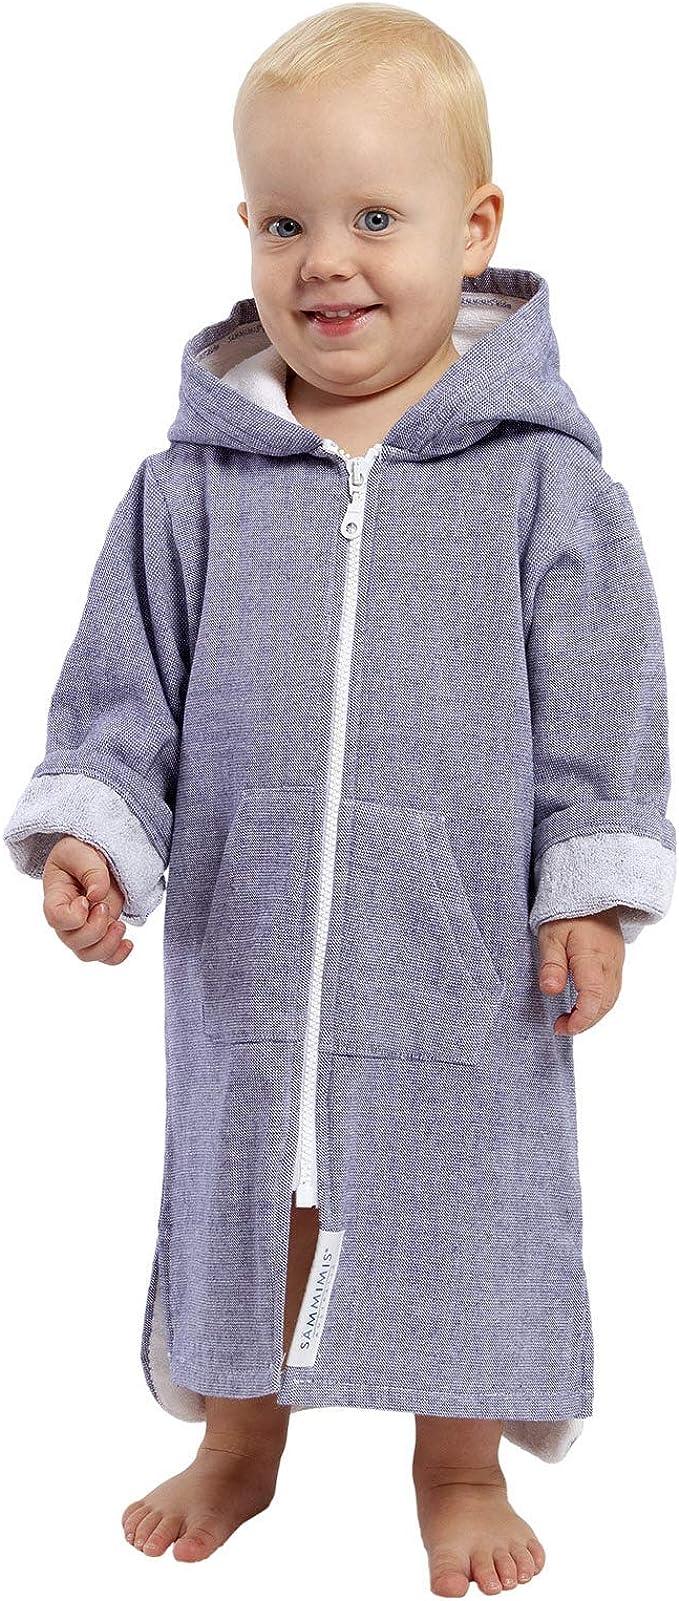 Sheridan Sammii Kids Hooded Bath Towel in Grey 65 x 130cm